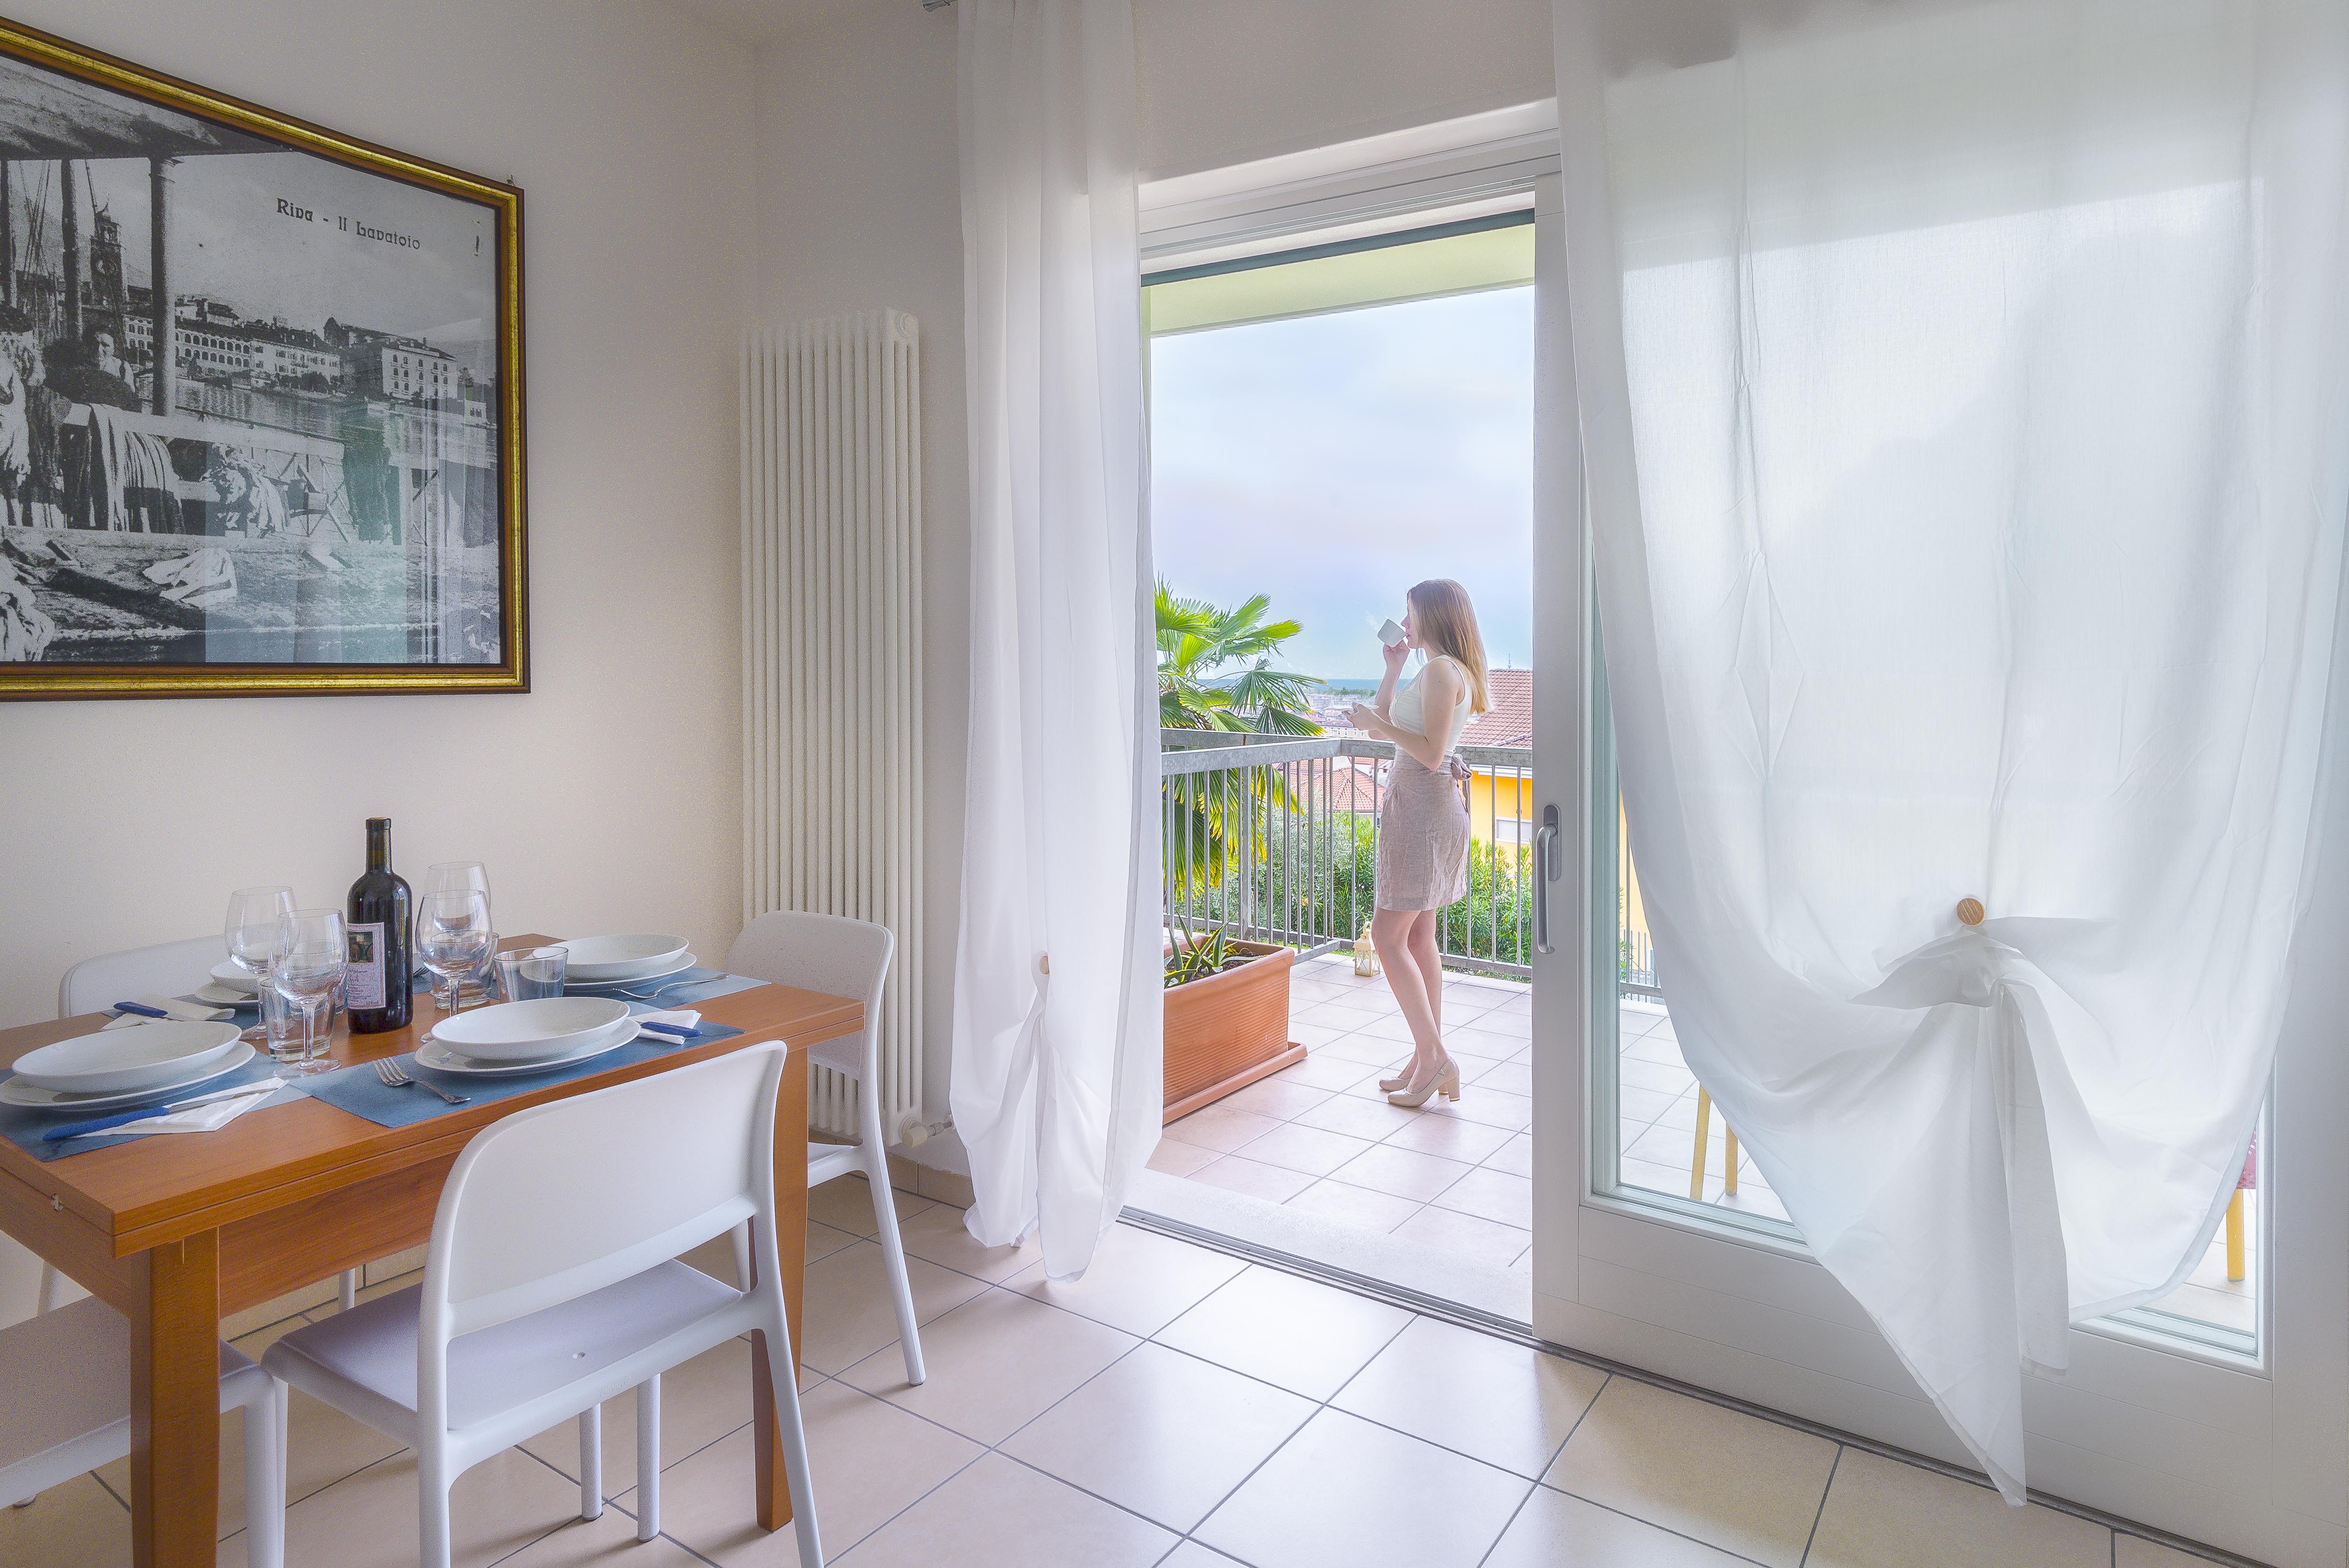 Ambienti Riva Del Garda garda lake view - superior apartment - apartments for rent